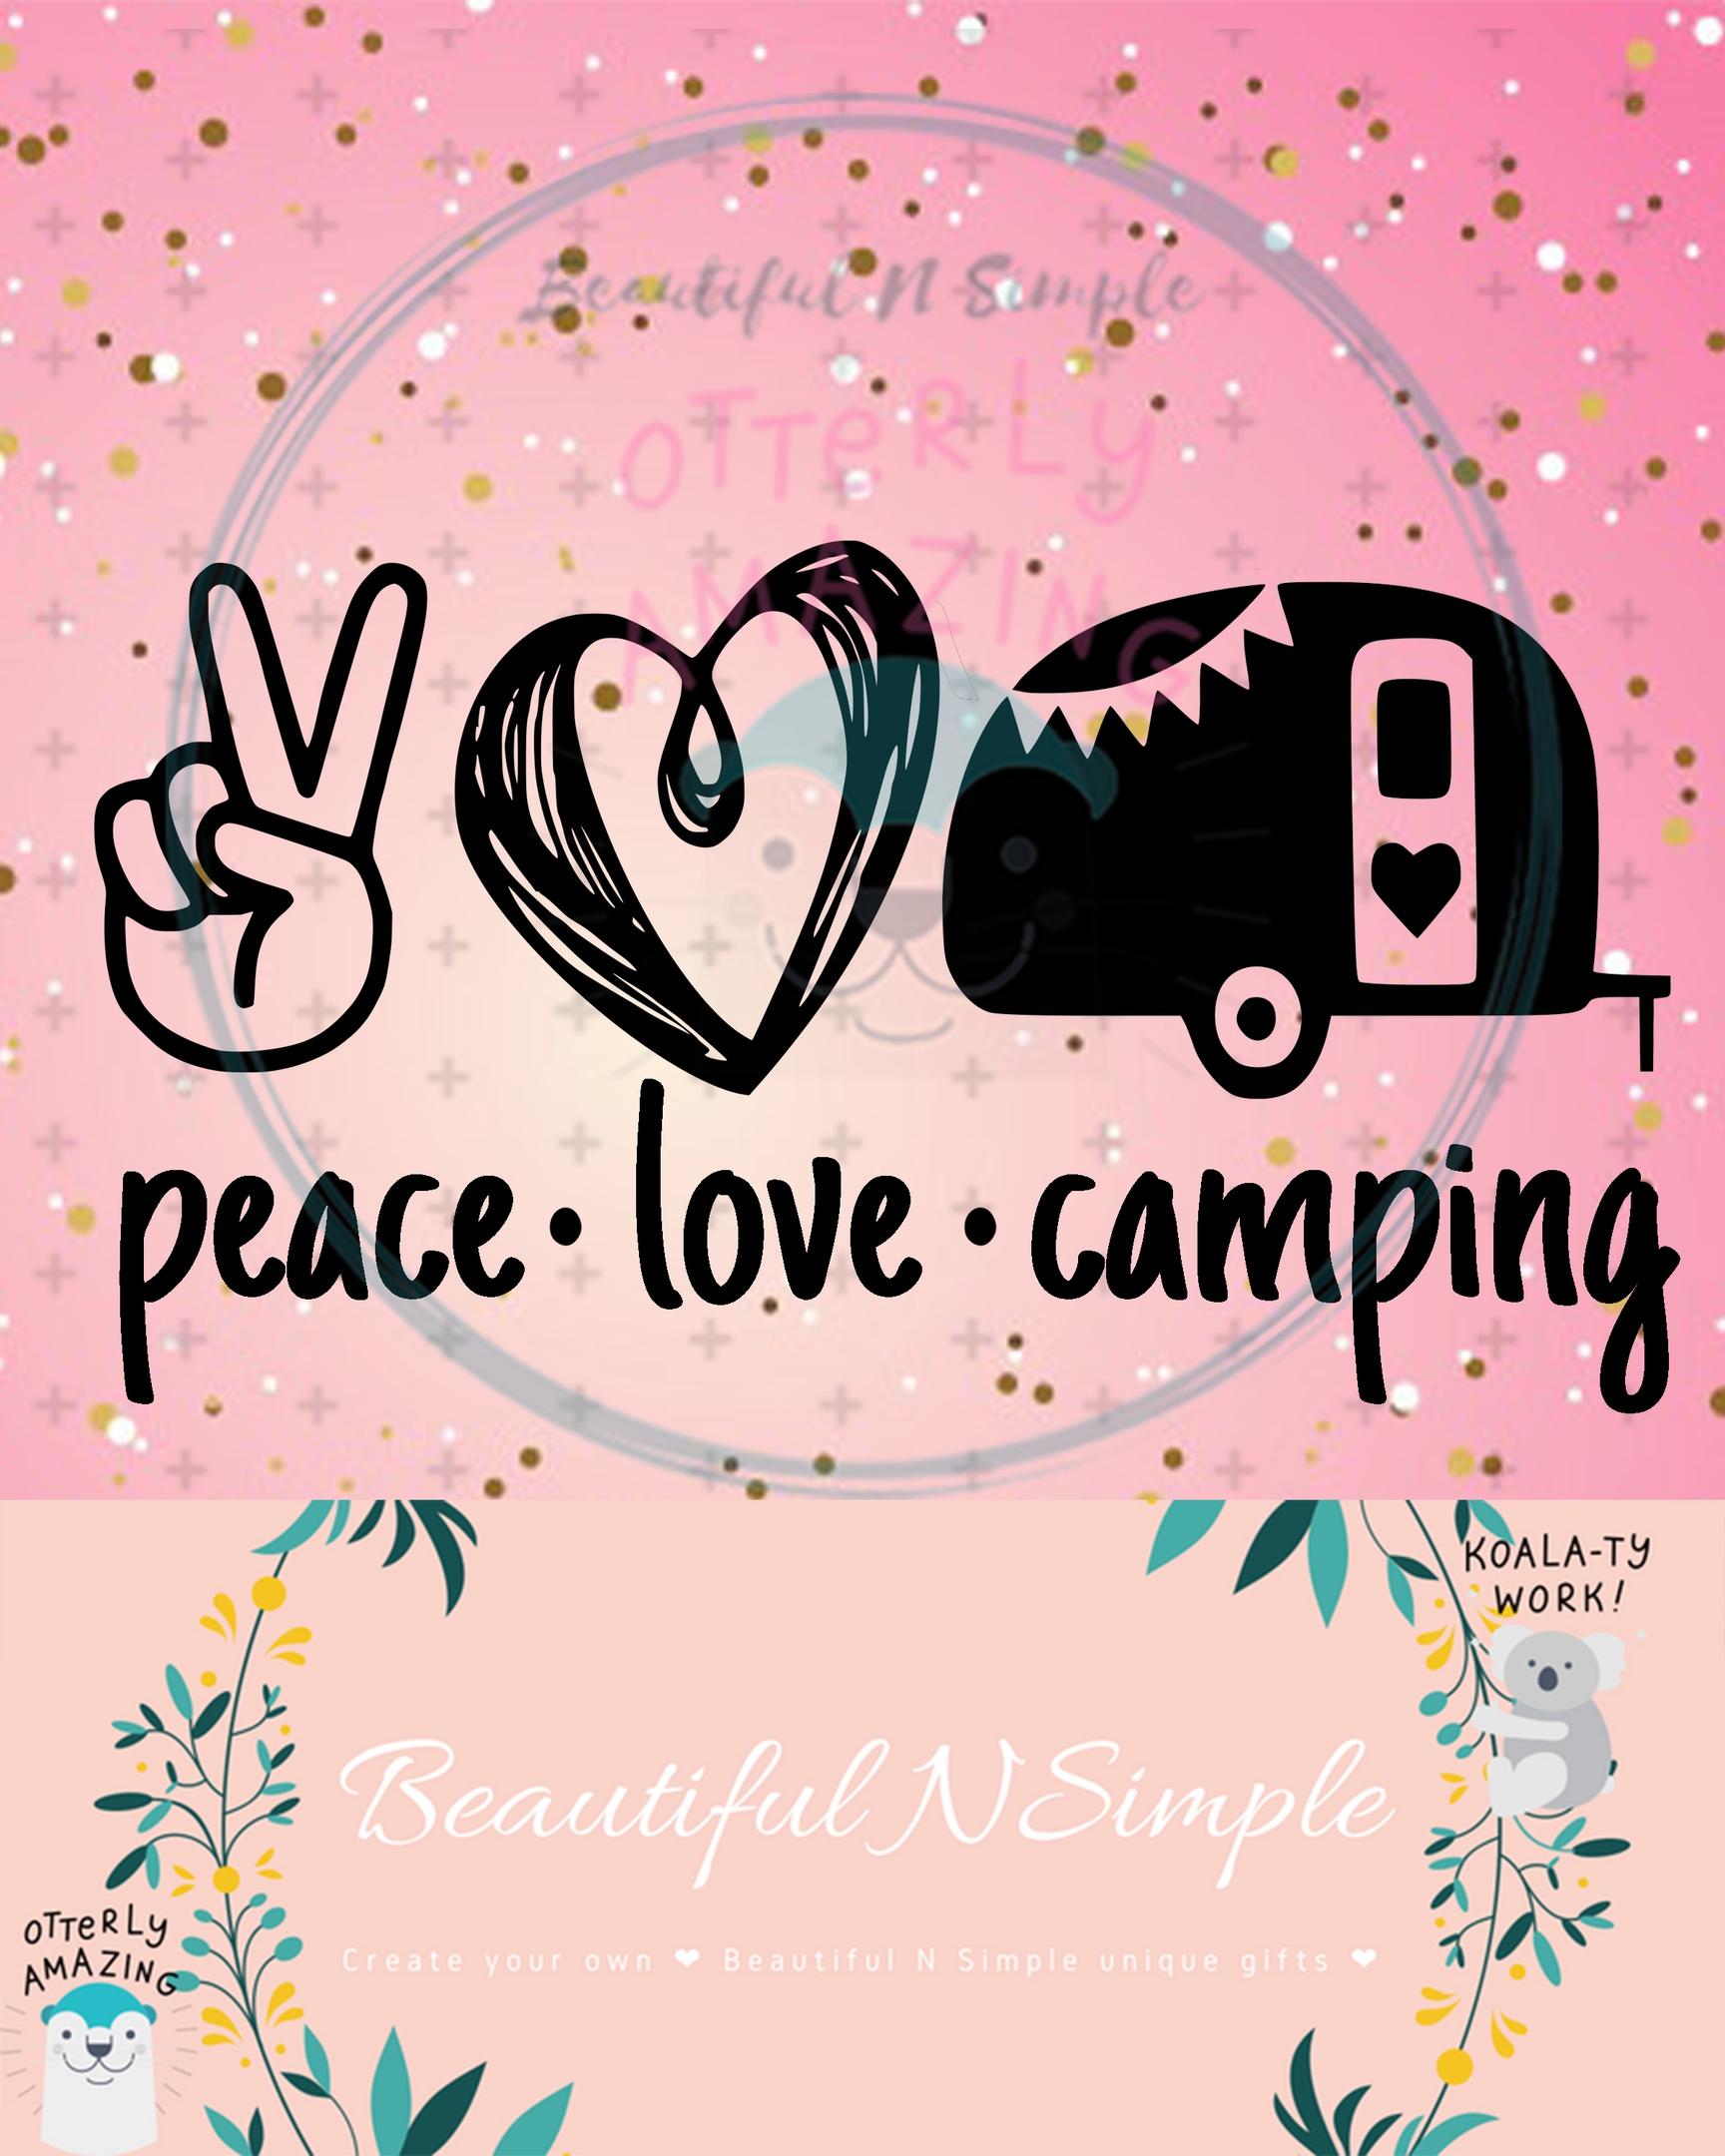 Camping Svg : camping, Peace, Camping, Camper,, BeautifulNSimple